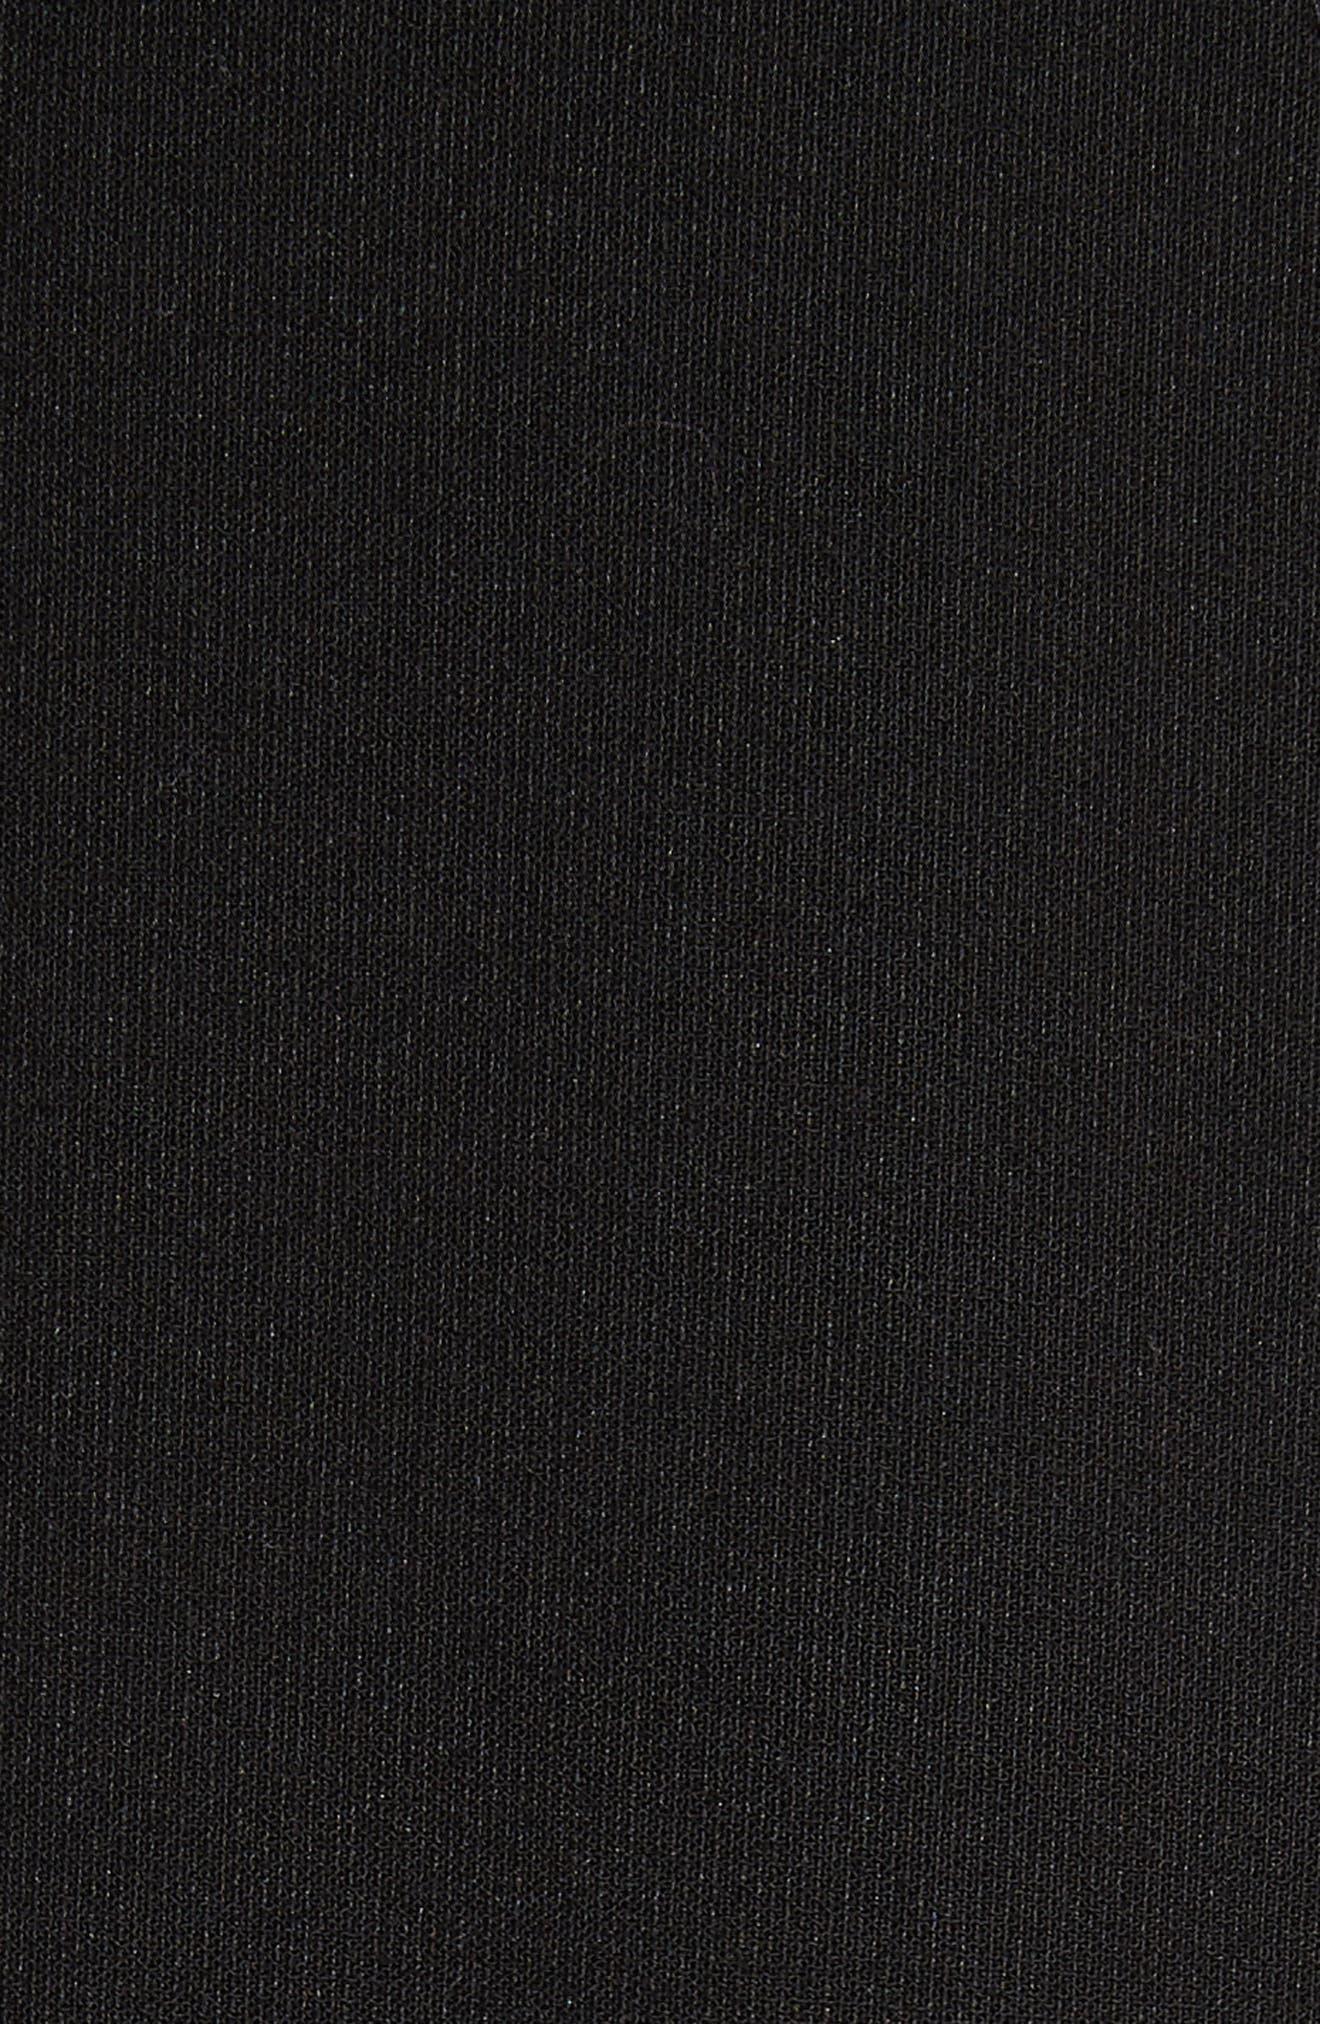 Lida Sheath Dress,                             Alternate thumbnail 5, color,                             001